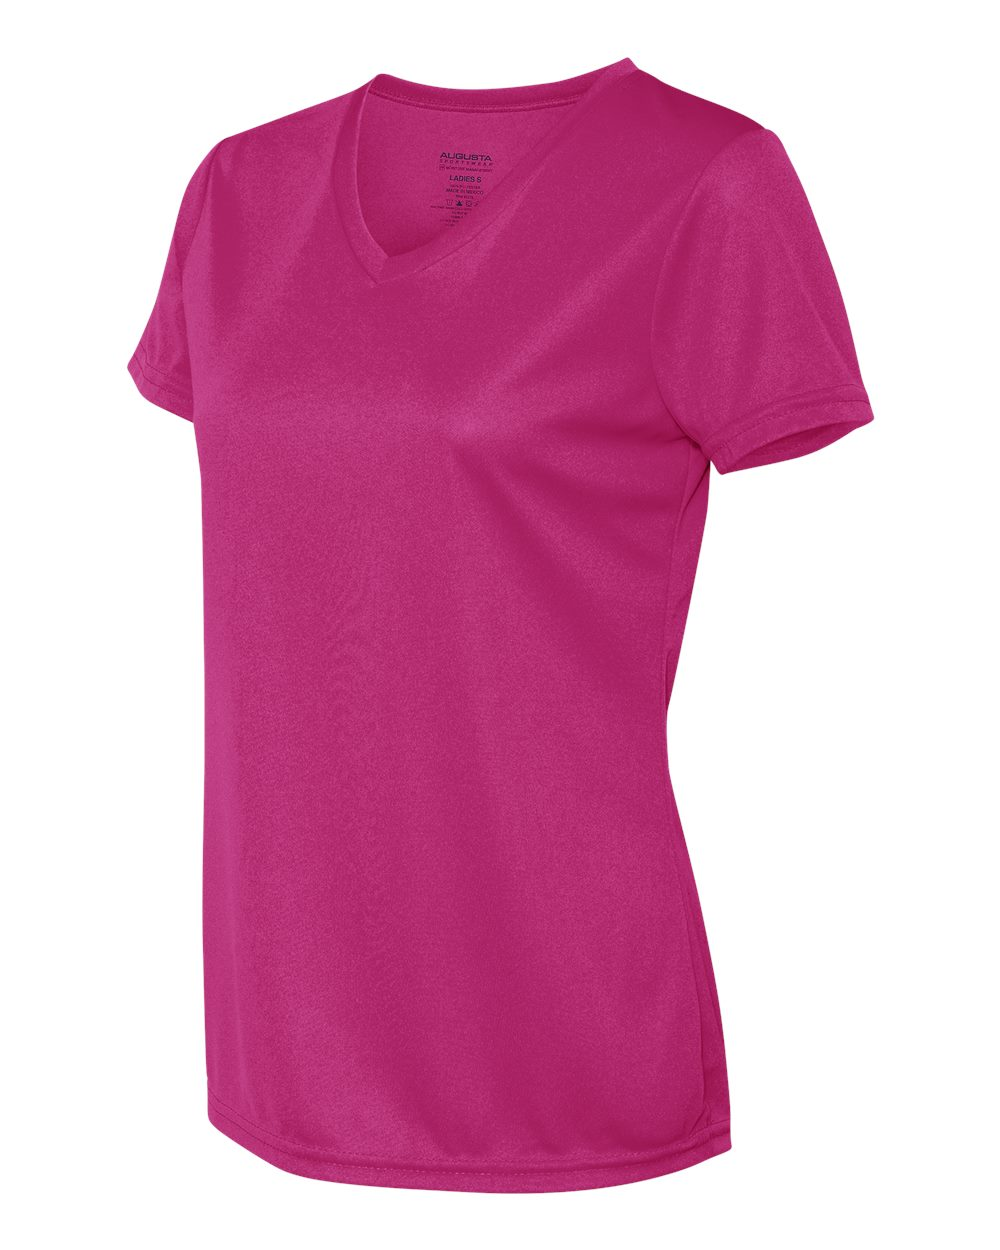 Augusta-Sportswear-Women-039-s-Moisture-Wicking-V-Neck-T-Shirt-1790-XS-2XL thumbnail 21